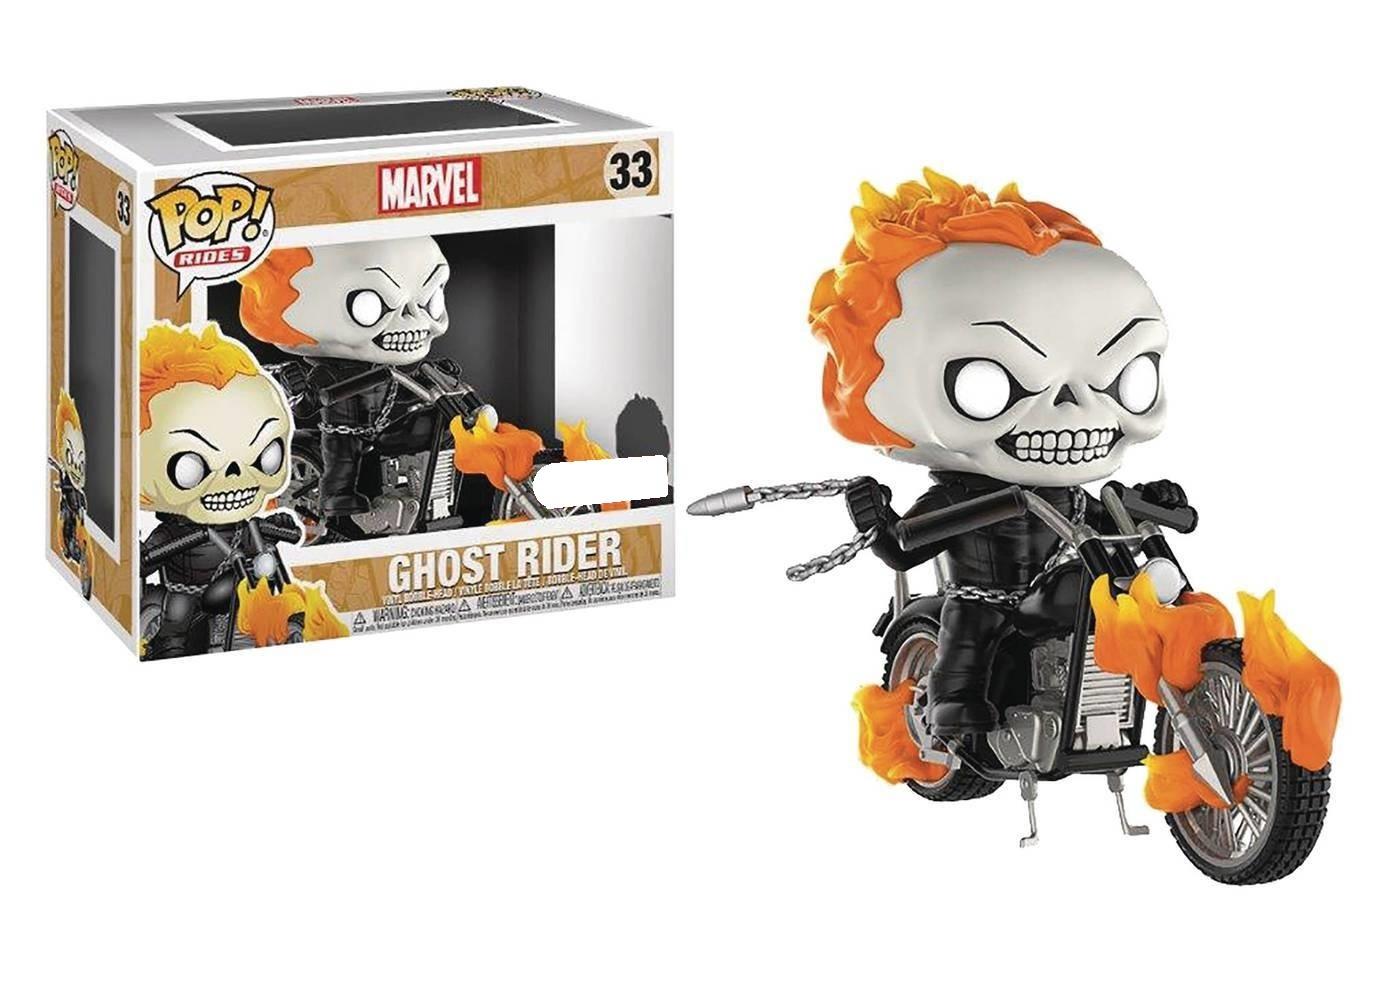 Marvel - Ghost Rider Pop! Rides Set image